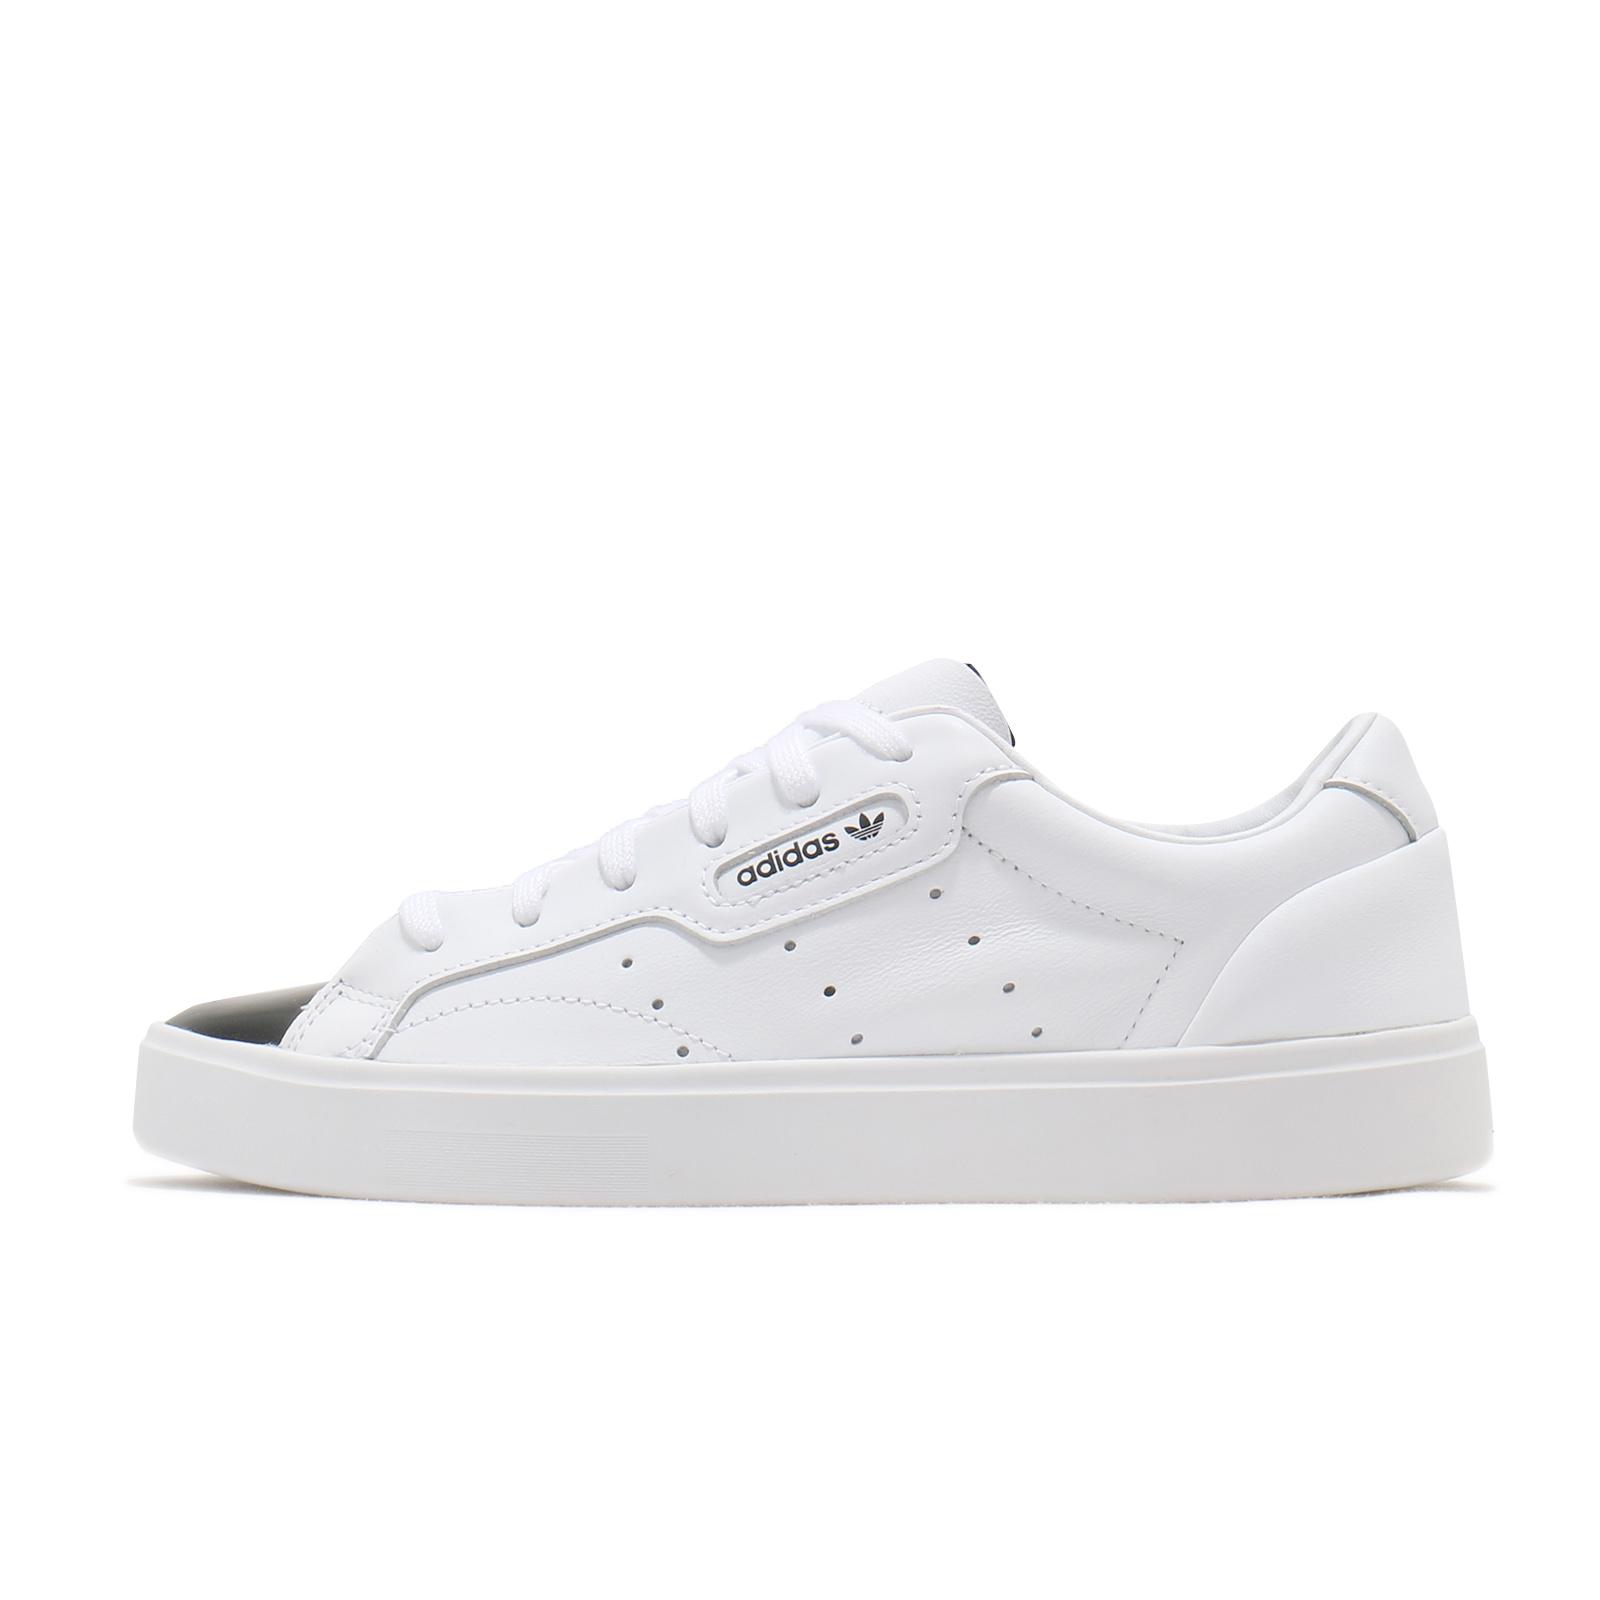 adidas 休閒鞋 Sleek W 白 黑 小白鞋 愛迪達 三葉草 女鞋 黑頭 【ACS】 EE4709